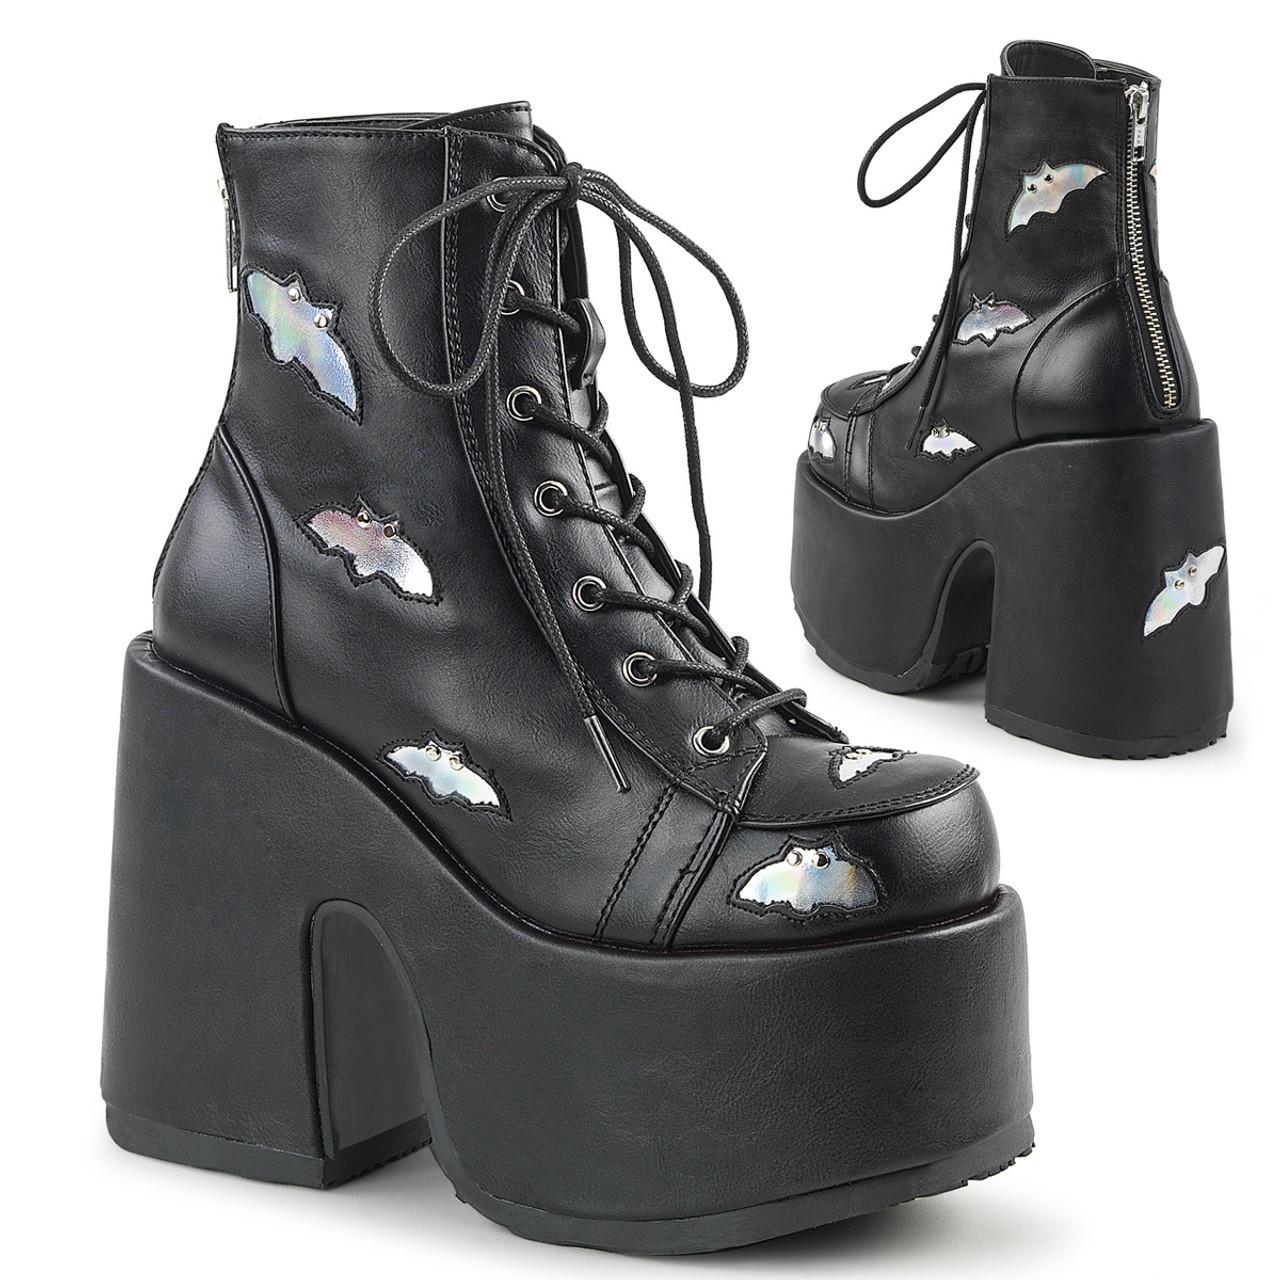 Demonia Womens MUERTO-2028 Knee Boots Black Vegan Leather Punk Goth Platform